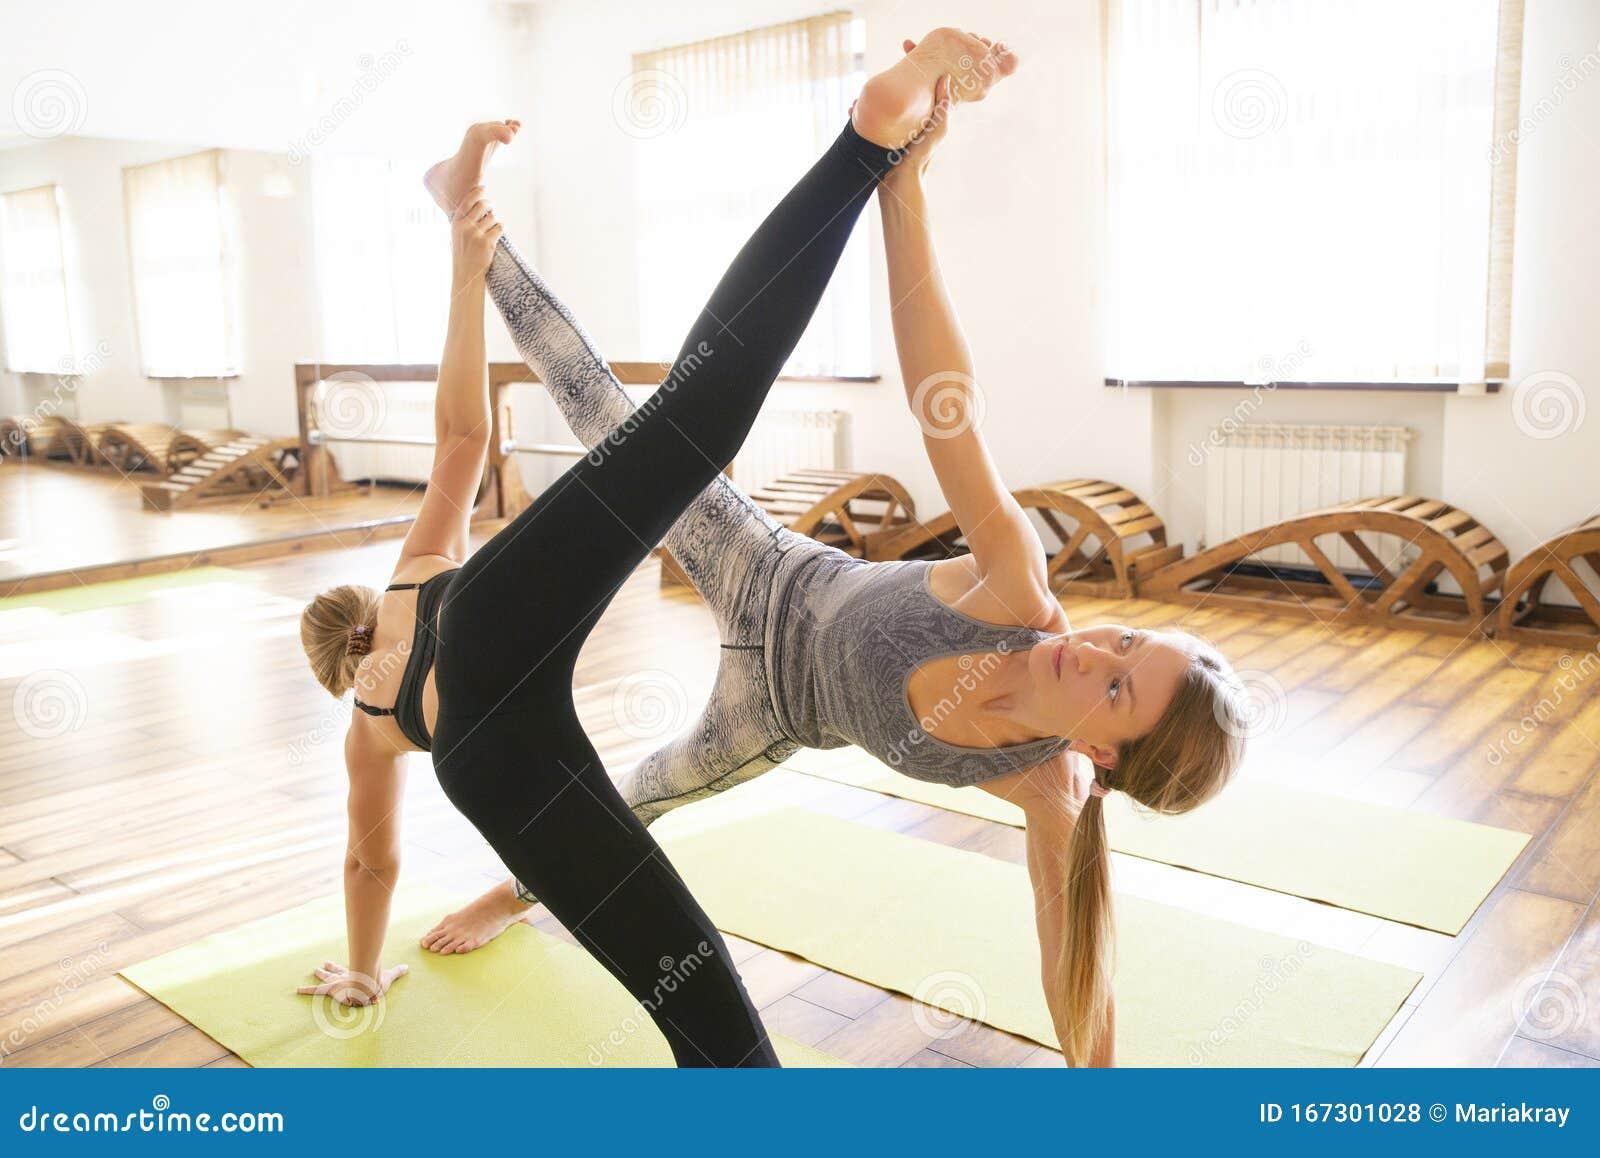 Yoga Class Two Girls Doing Yoga Pose Wellness And Healthy Lifestyle Stock Photo Image Of Asana Beautiful 167301028